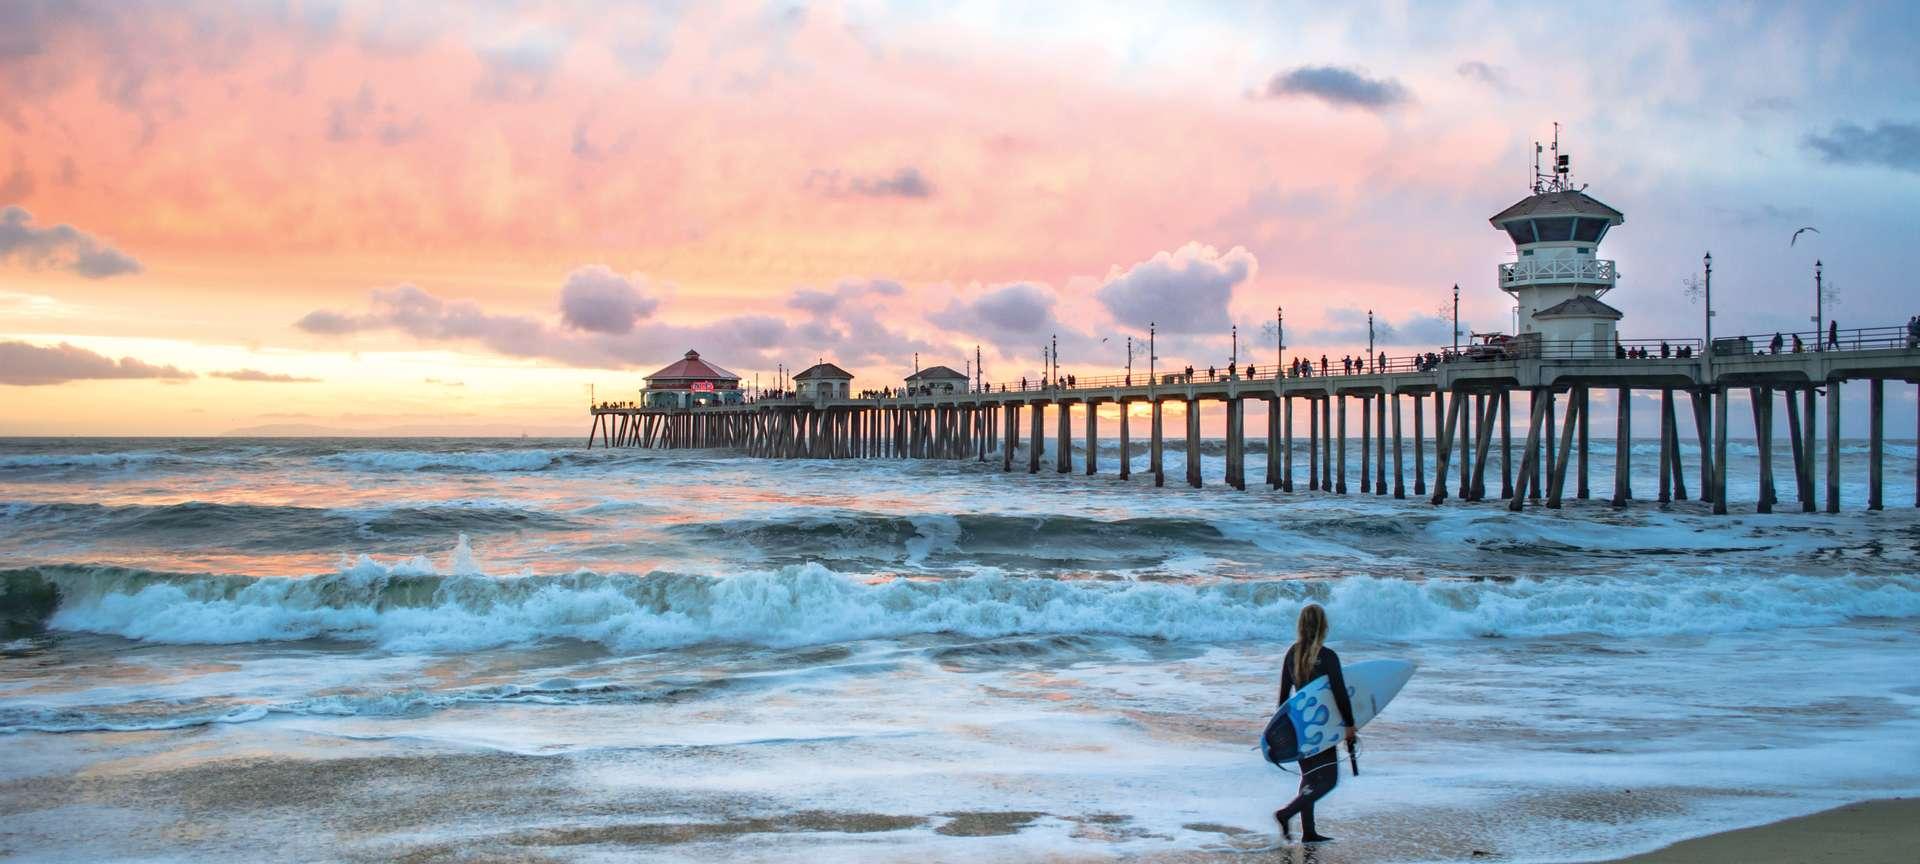 Huntington Beach Visitors Guide 2019 2020